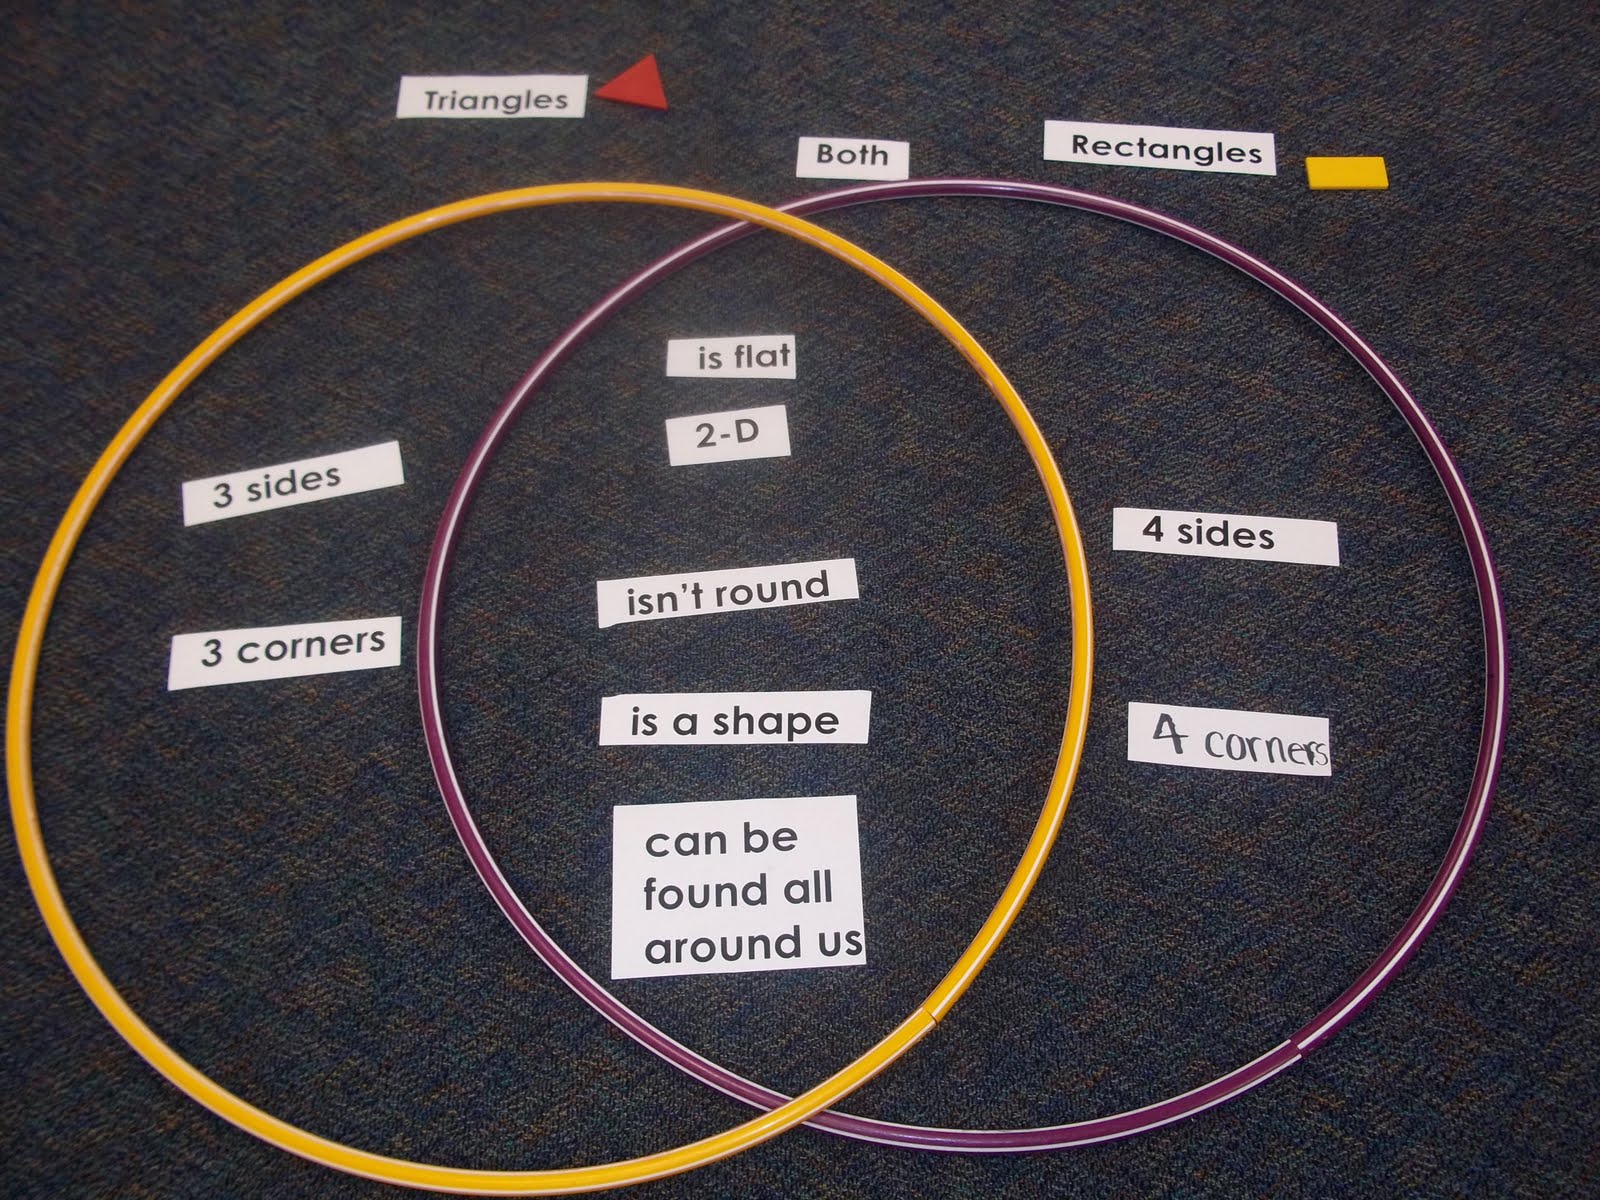 venn diagram sorting shapes database er for courier management system mrs wood 39s kindergarten class